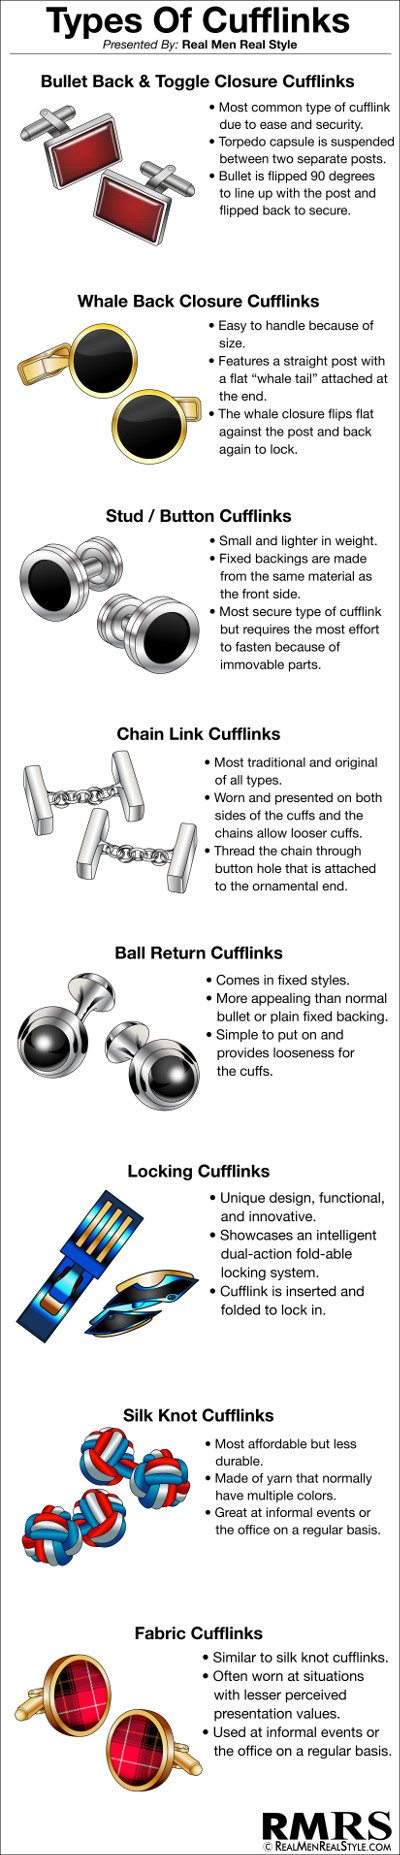 Types-Of-Cufflinks 400